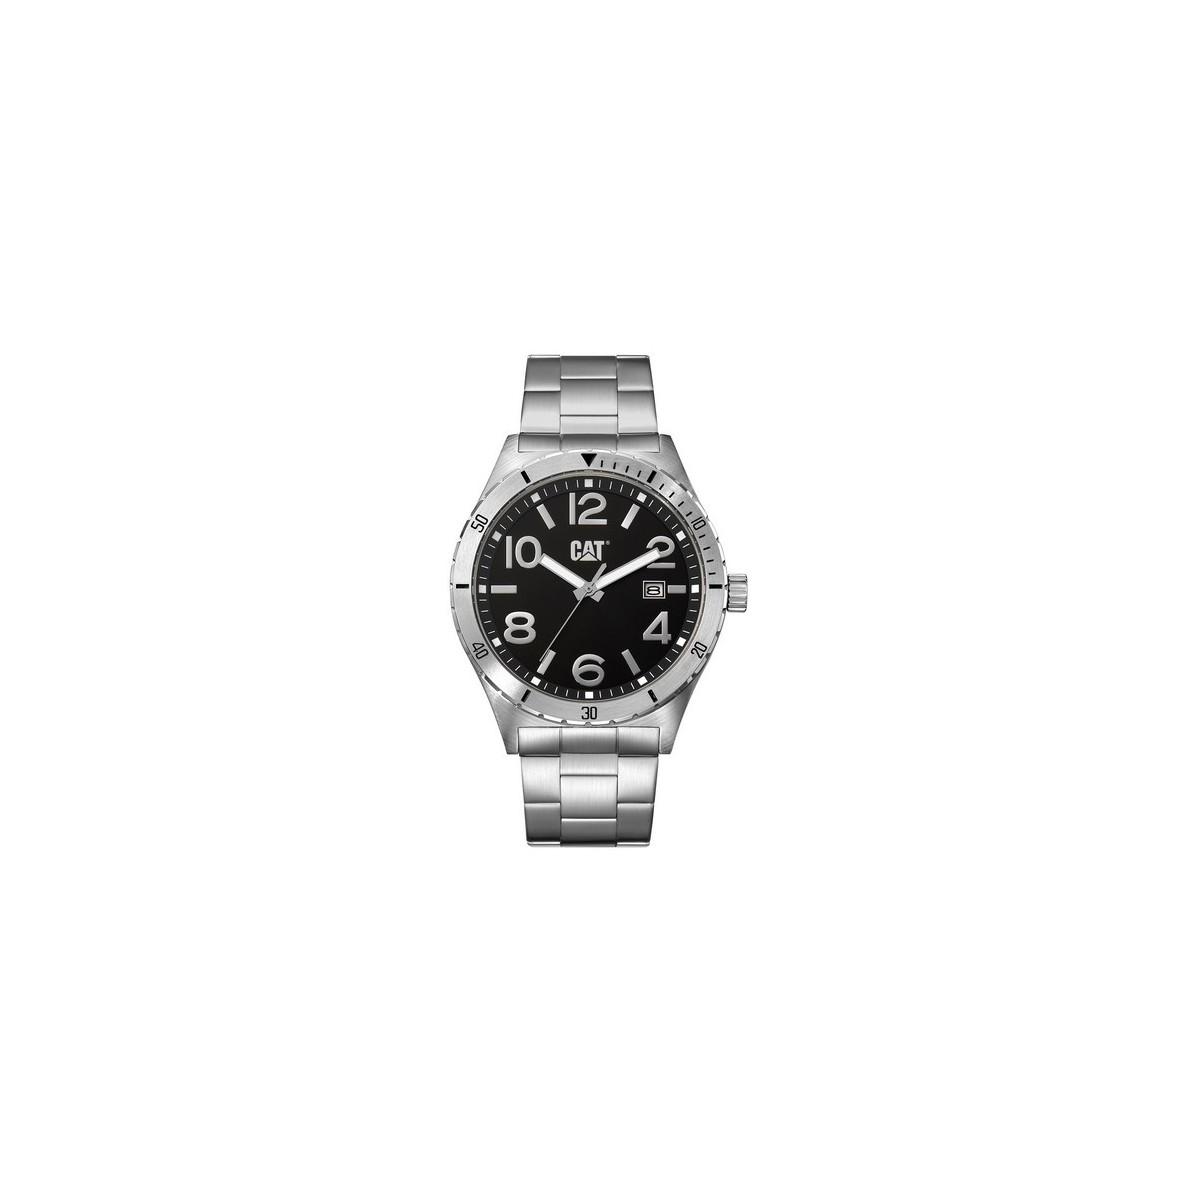 https://www.gaberjoyeria.com/3412-thickbox_default/reloj-caterpillar.jpg